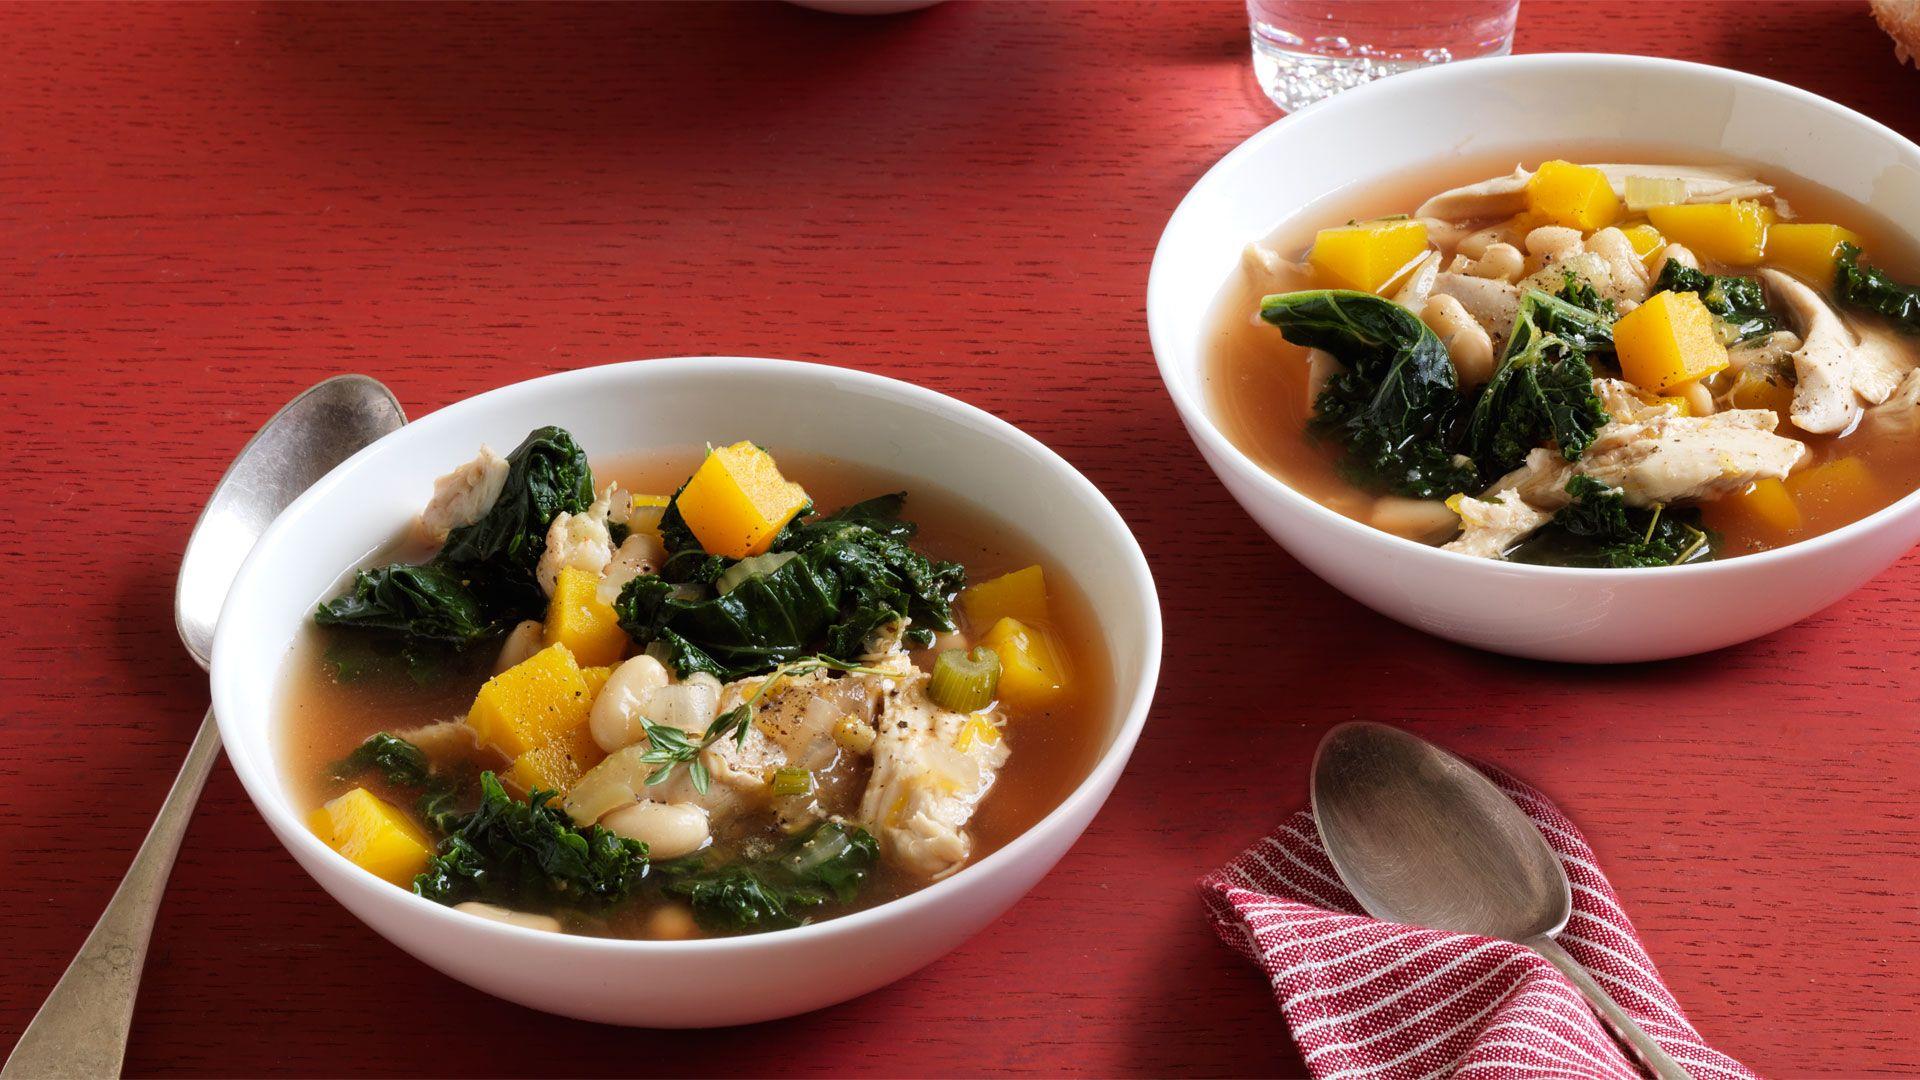 Kale, White Bean, and Butternut Squash Soup